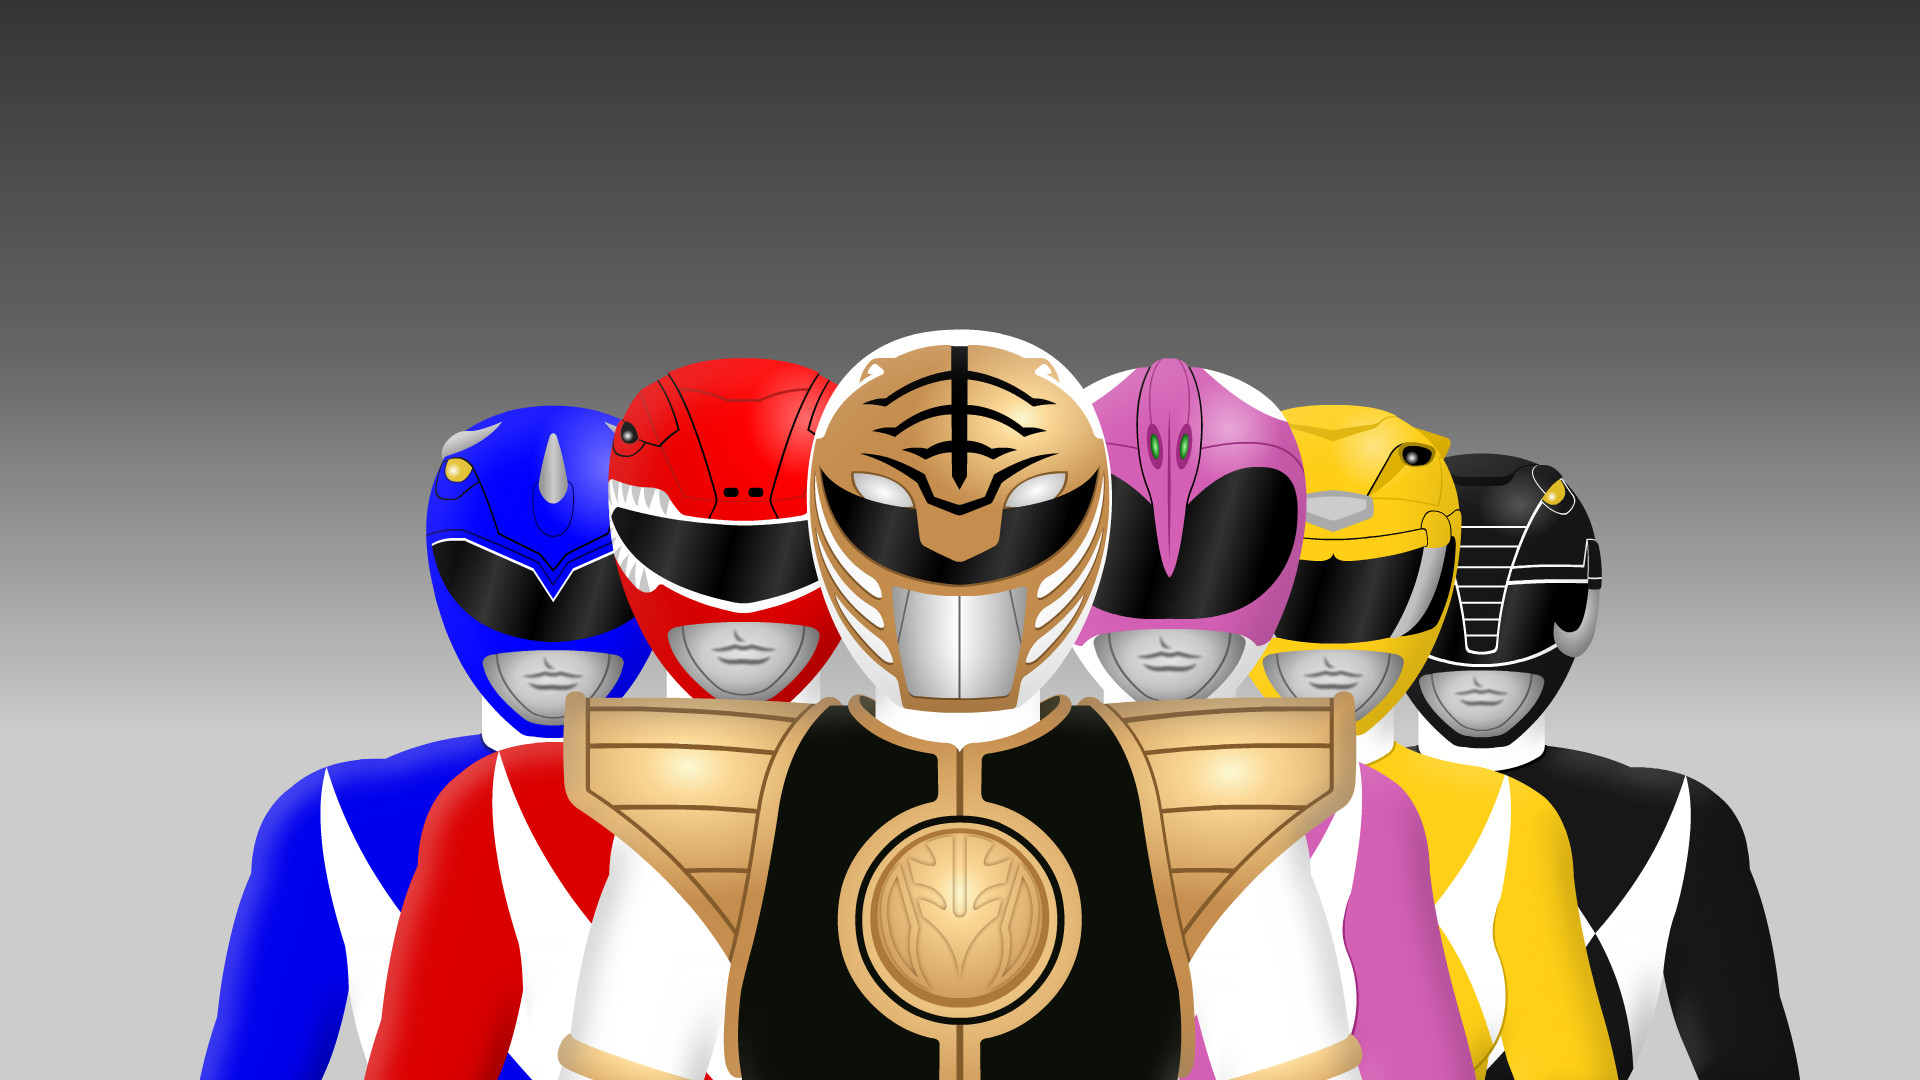 Mighty Morphin Power Rangers by Yurtigo Mighty Morphin Power Rangers by  Yurtigo